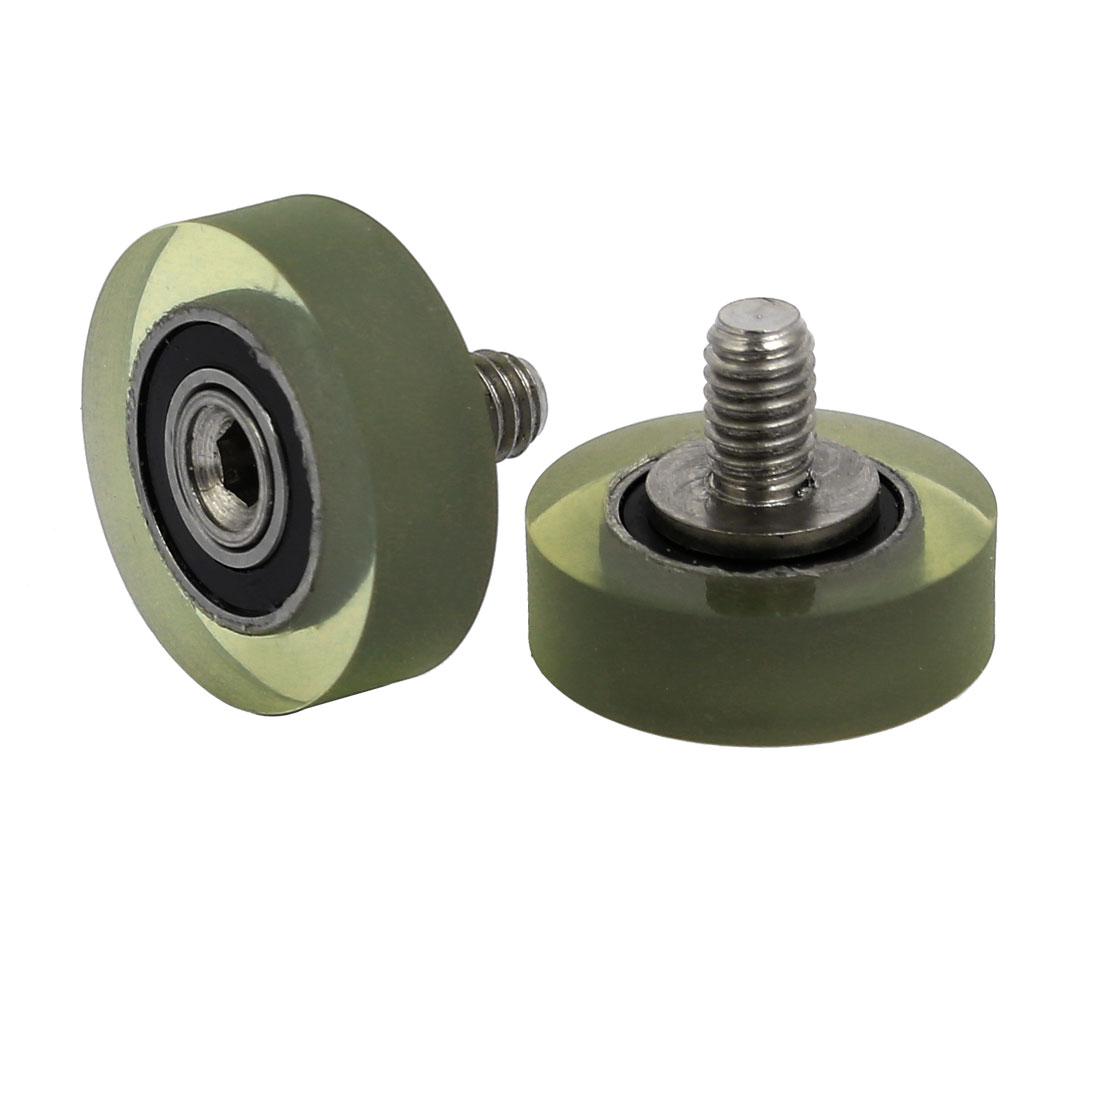 2pcs M4 x 6mm Thread F Type Idler Bearing Pulley 5mm x 16mm x 5mm